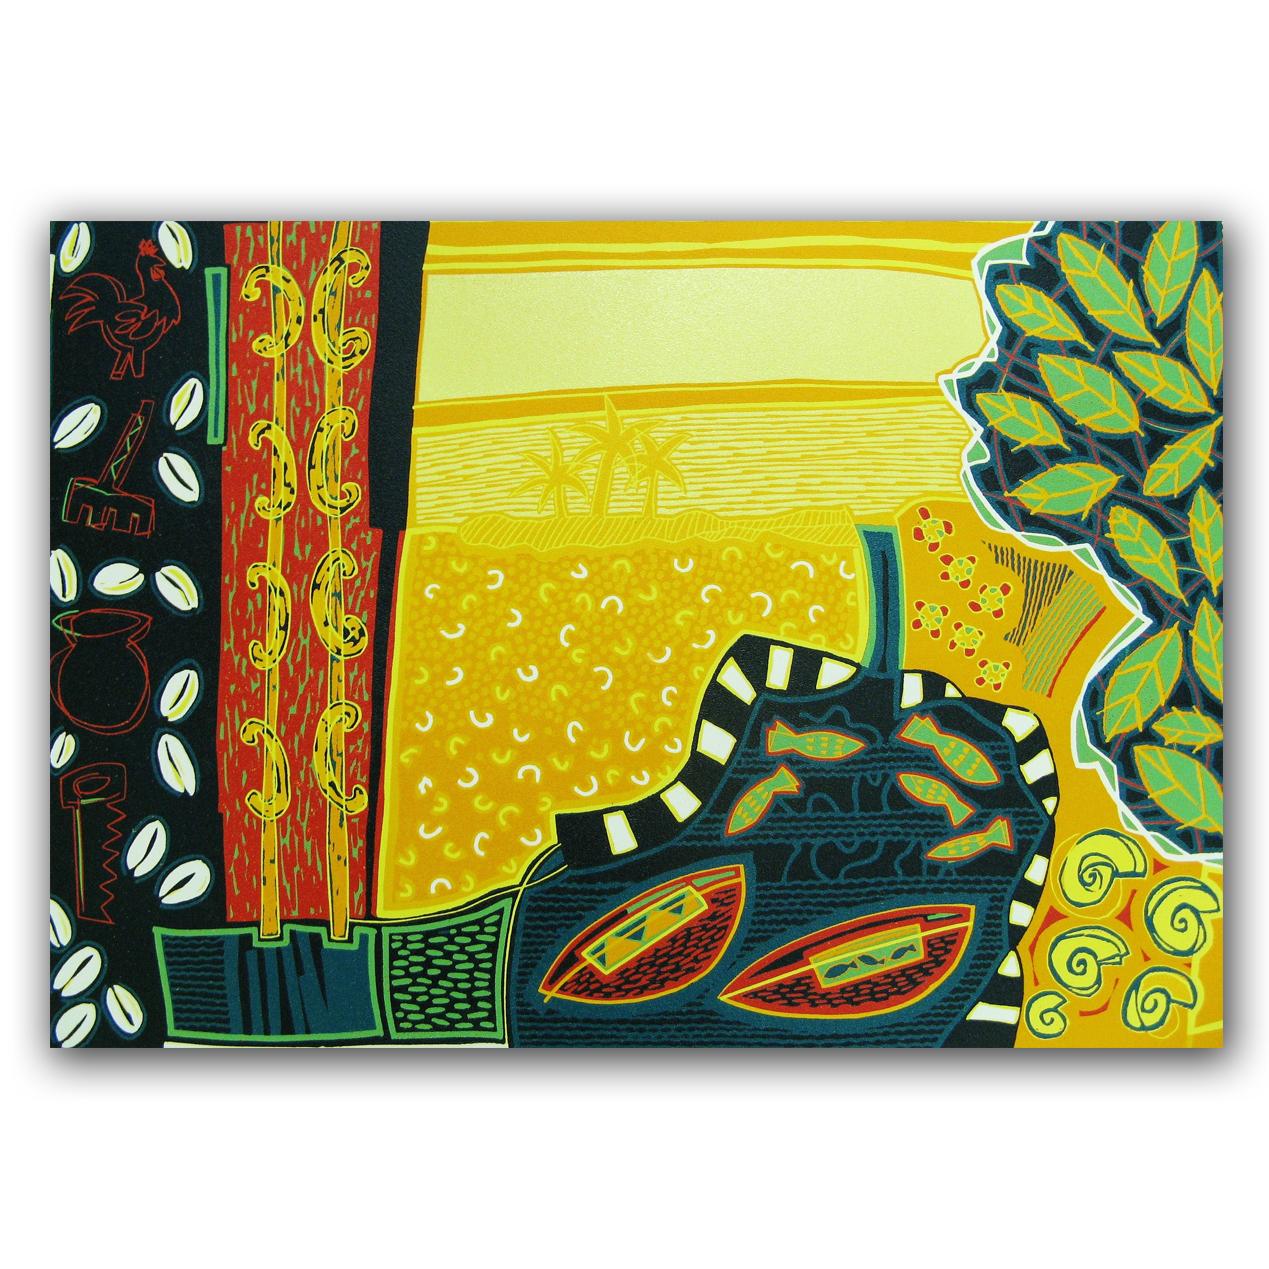 Cuba Linda, lino 78x54 cm, 2005. Diana van Hal.